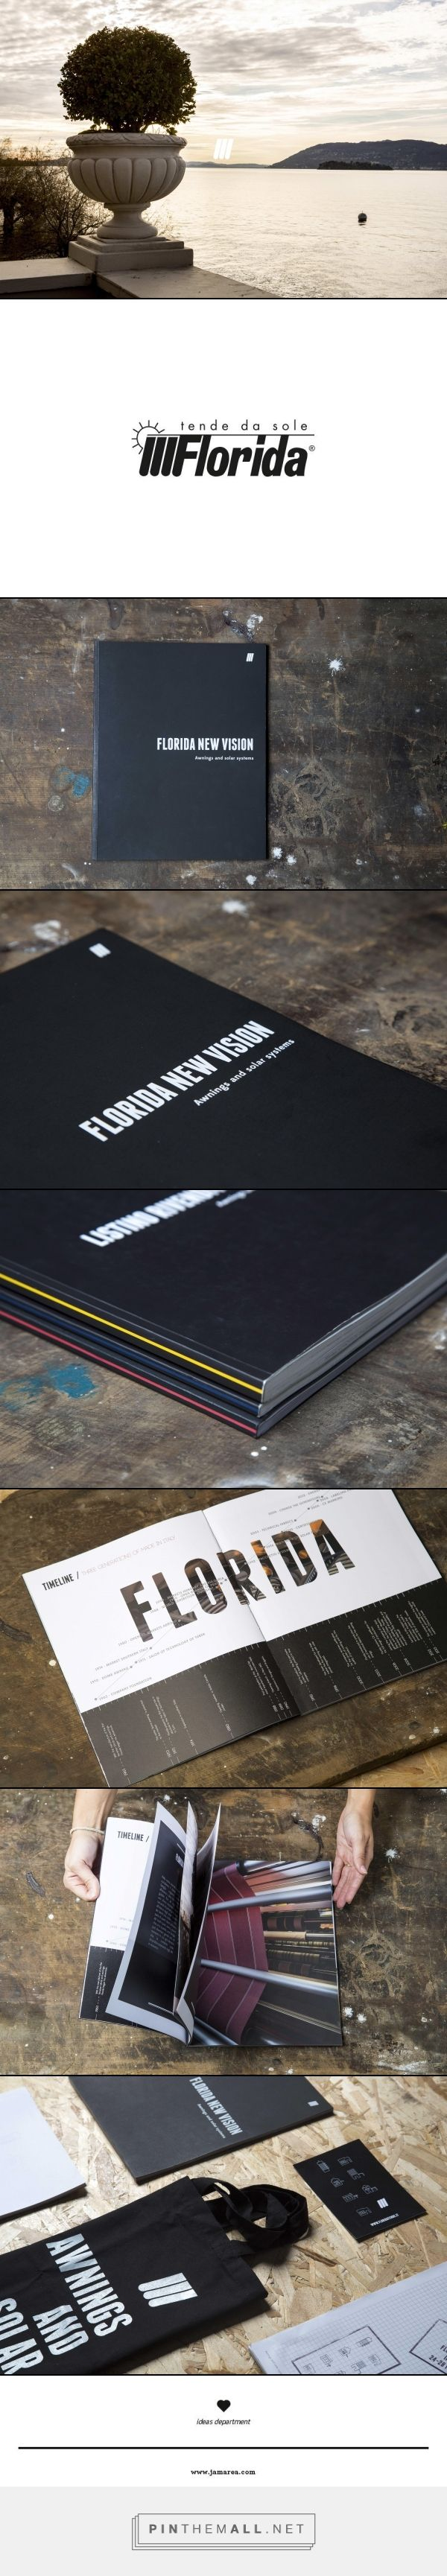 Florida Tende - Restyling, Graphic Design, Ideas, Catalogue, Brand Development, Trough the line | Jam Area